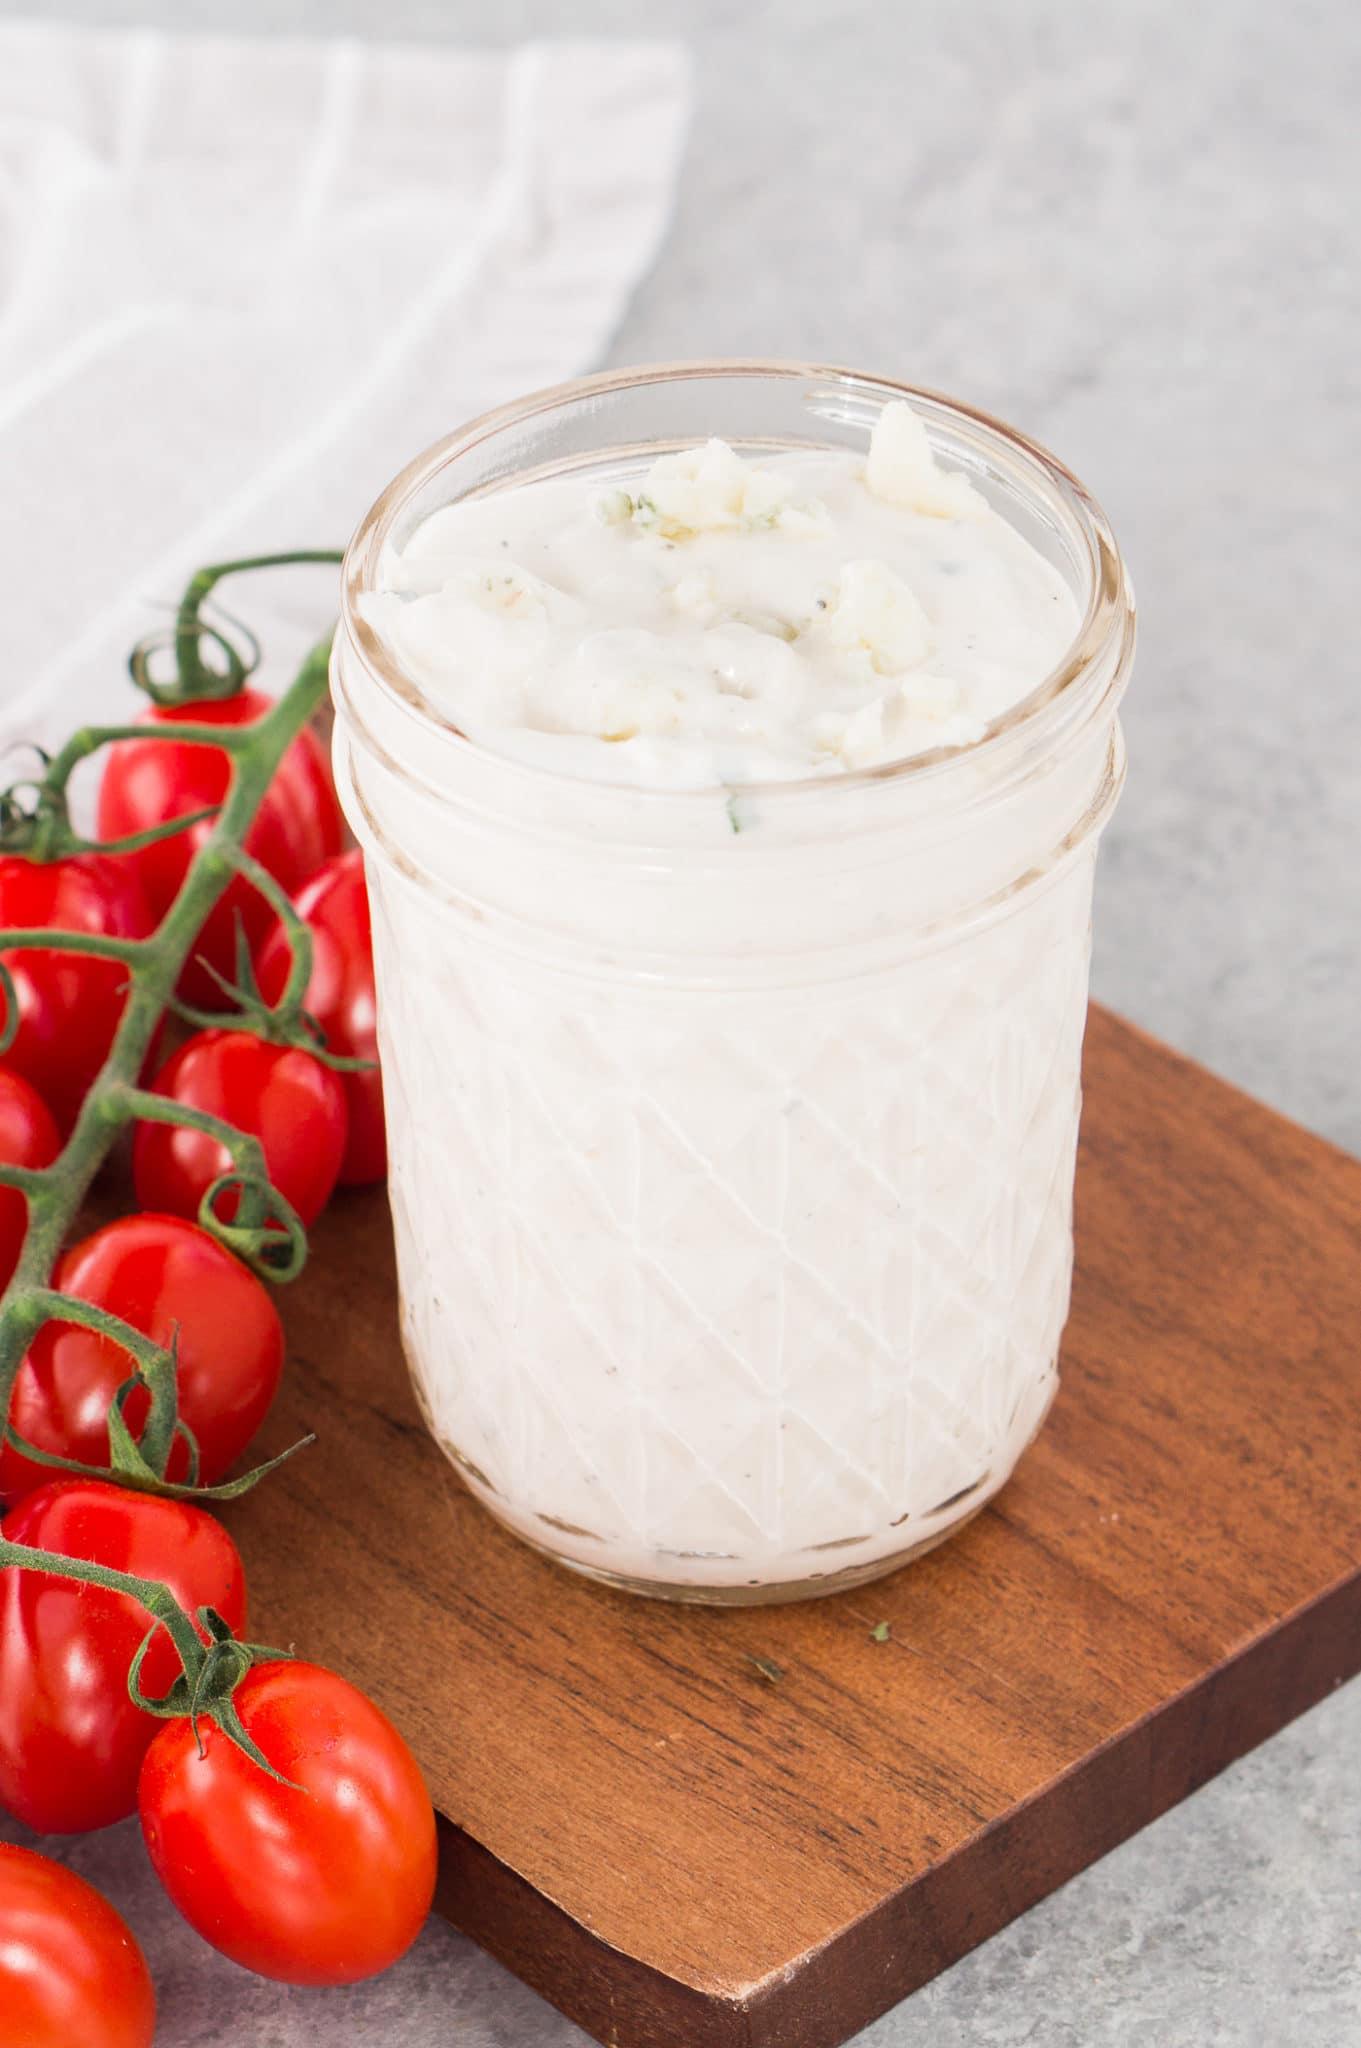 blue cheese dressing in a jar